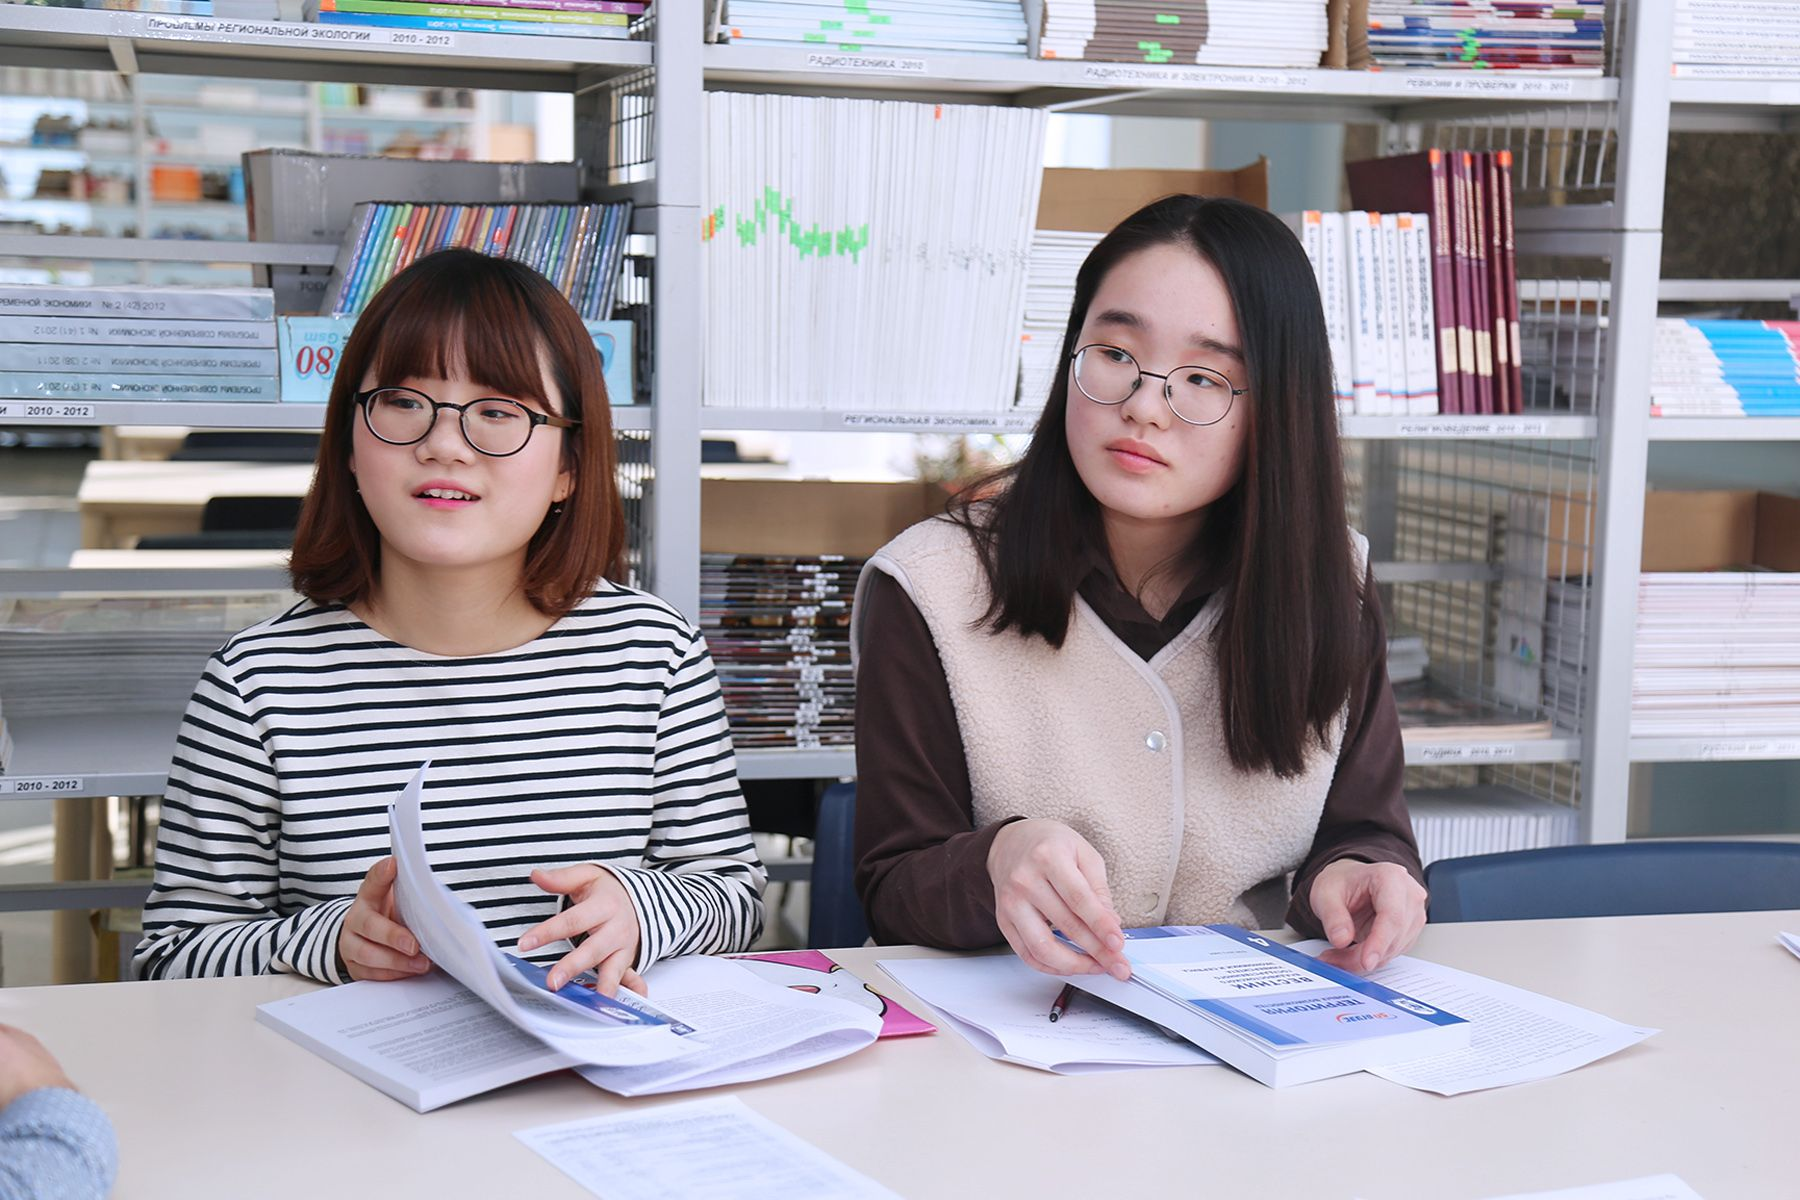 Студенты из Южной Кореи посетили библиотеку ВГУЭС